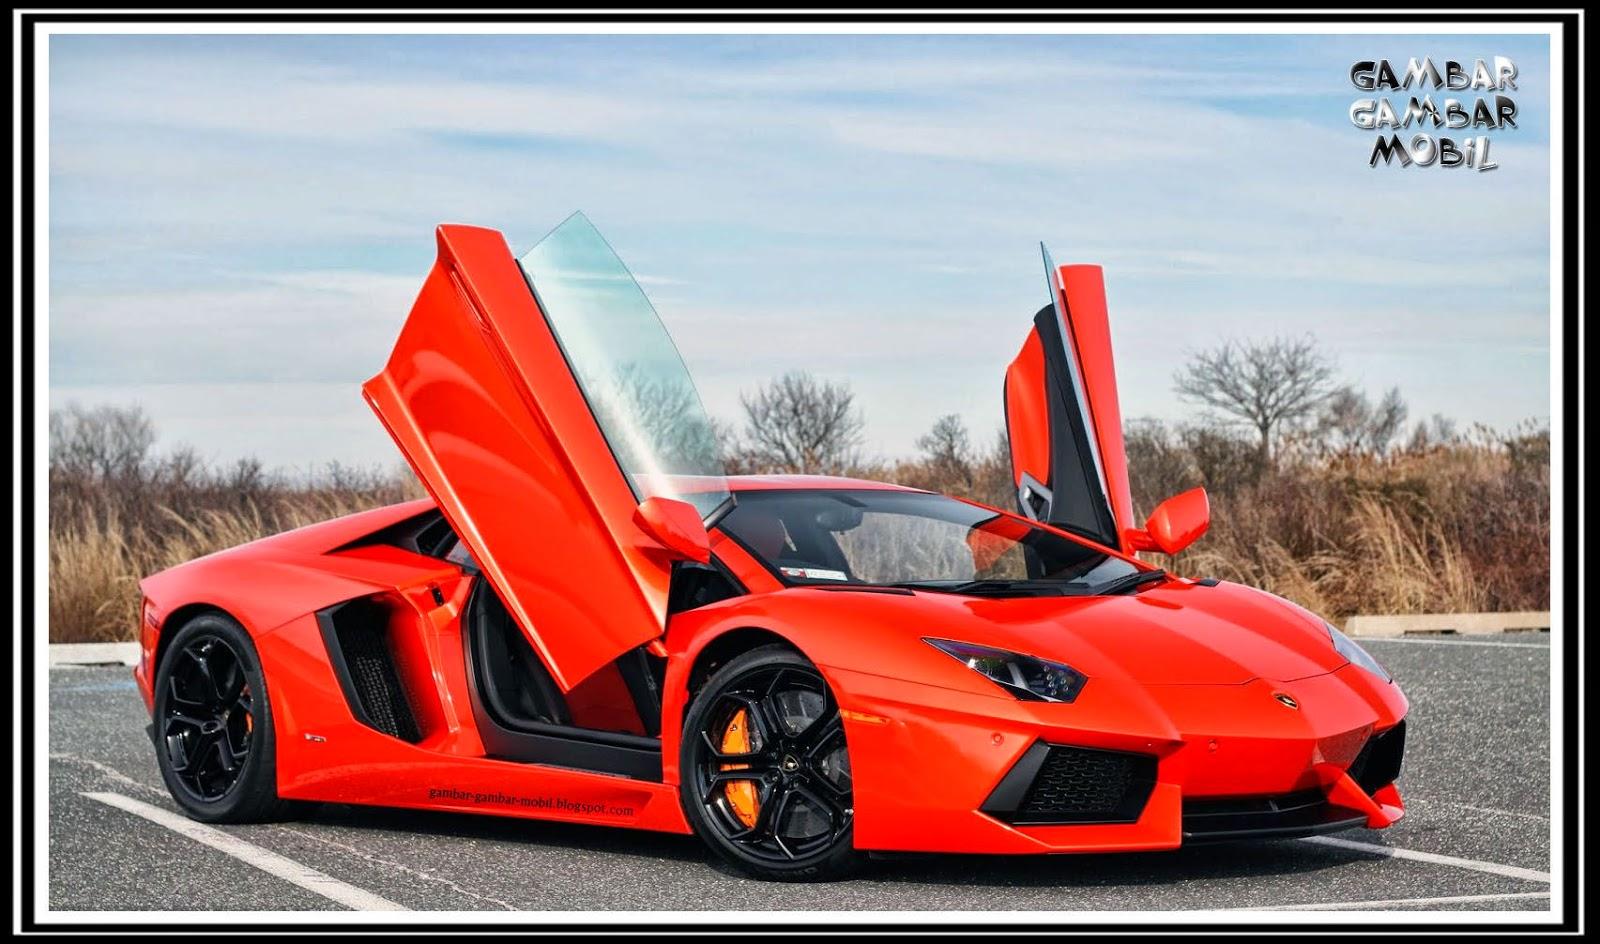 Gambar Mobil Lamborghini: Gambar Mobil Lamborghini Terbaru